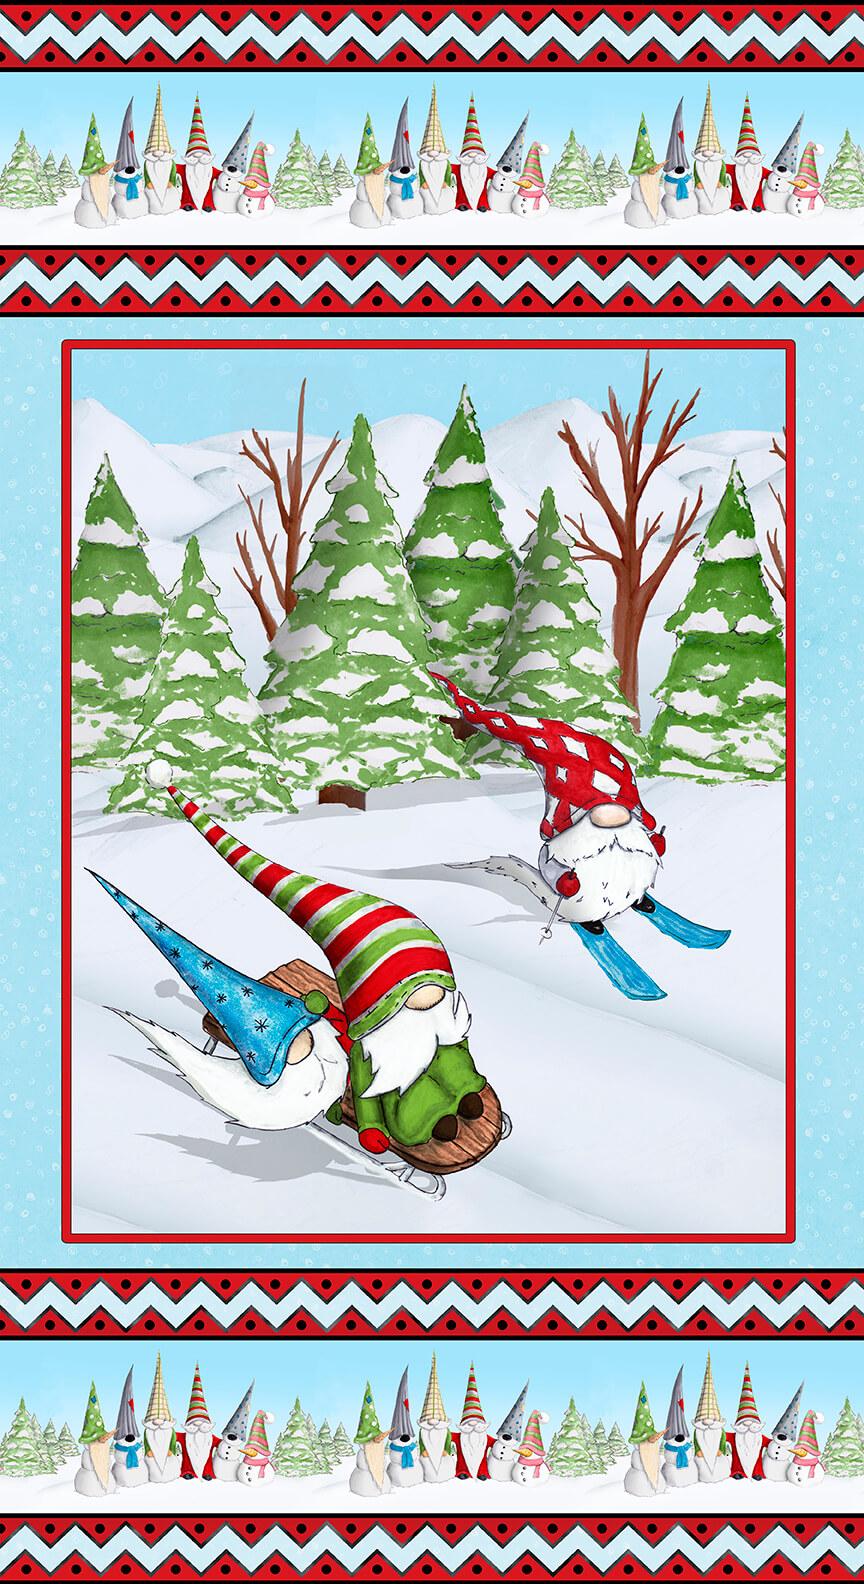 Gnoming Through the Snow Gnomes Skiing Panel 1098P-11